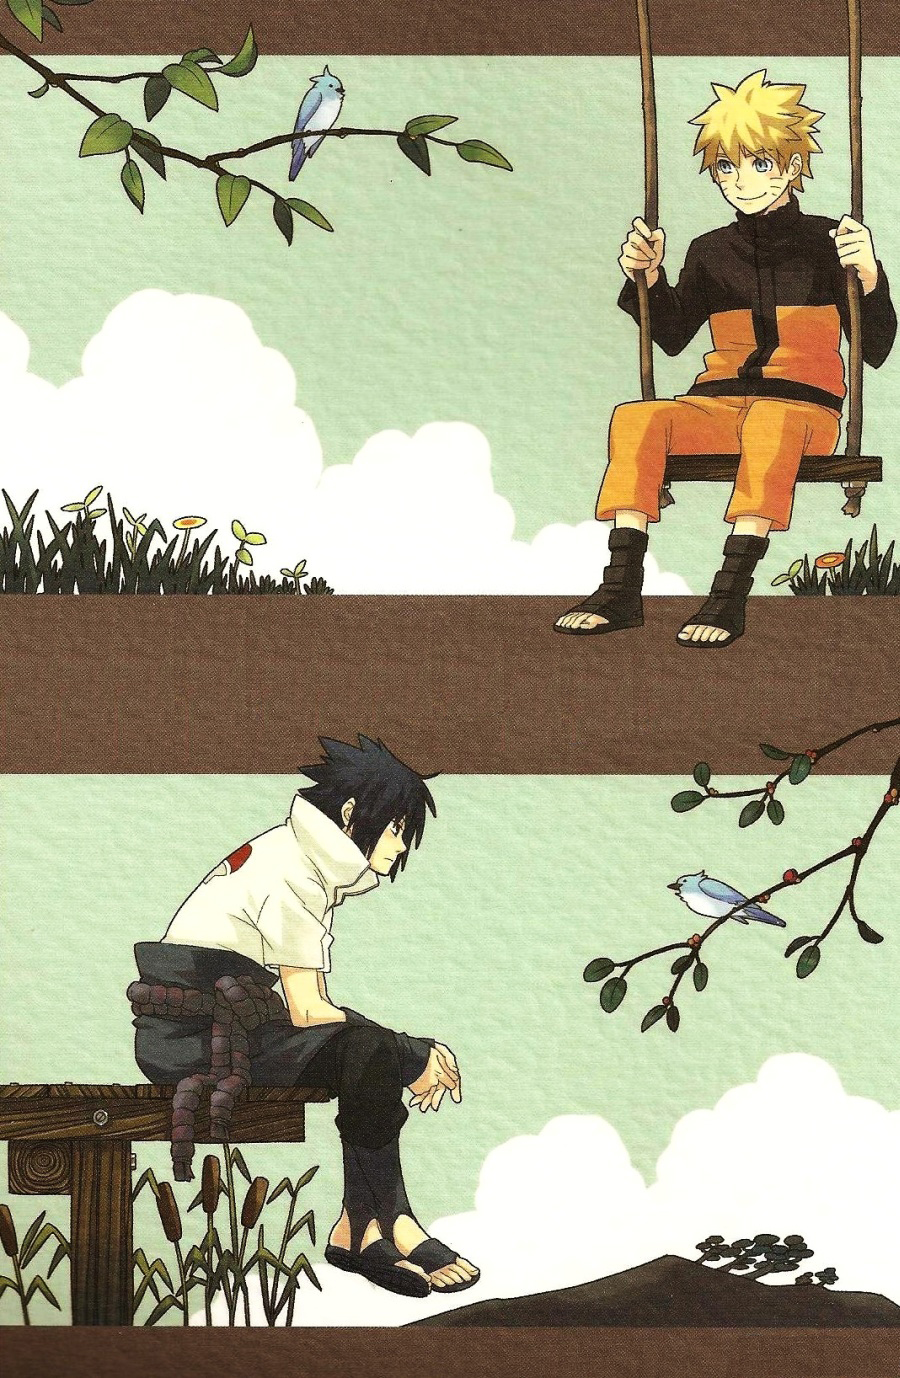 Hình ảnh  NaruSasu4ever %25252017%252520yearold%252520report cover in Naruto Doujinshi - White paper